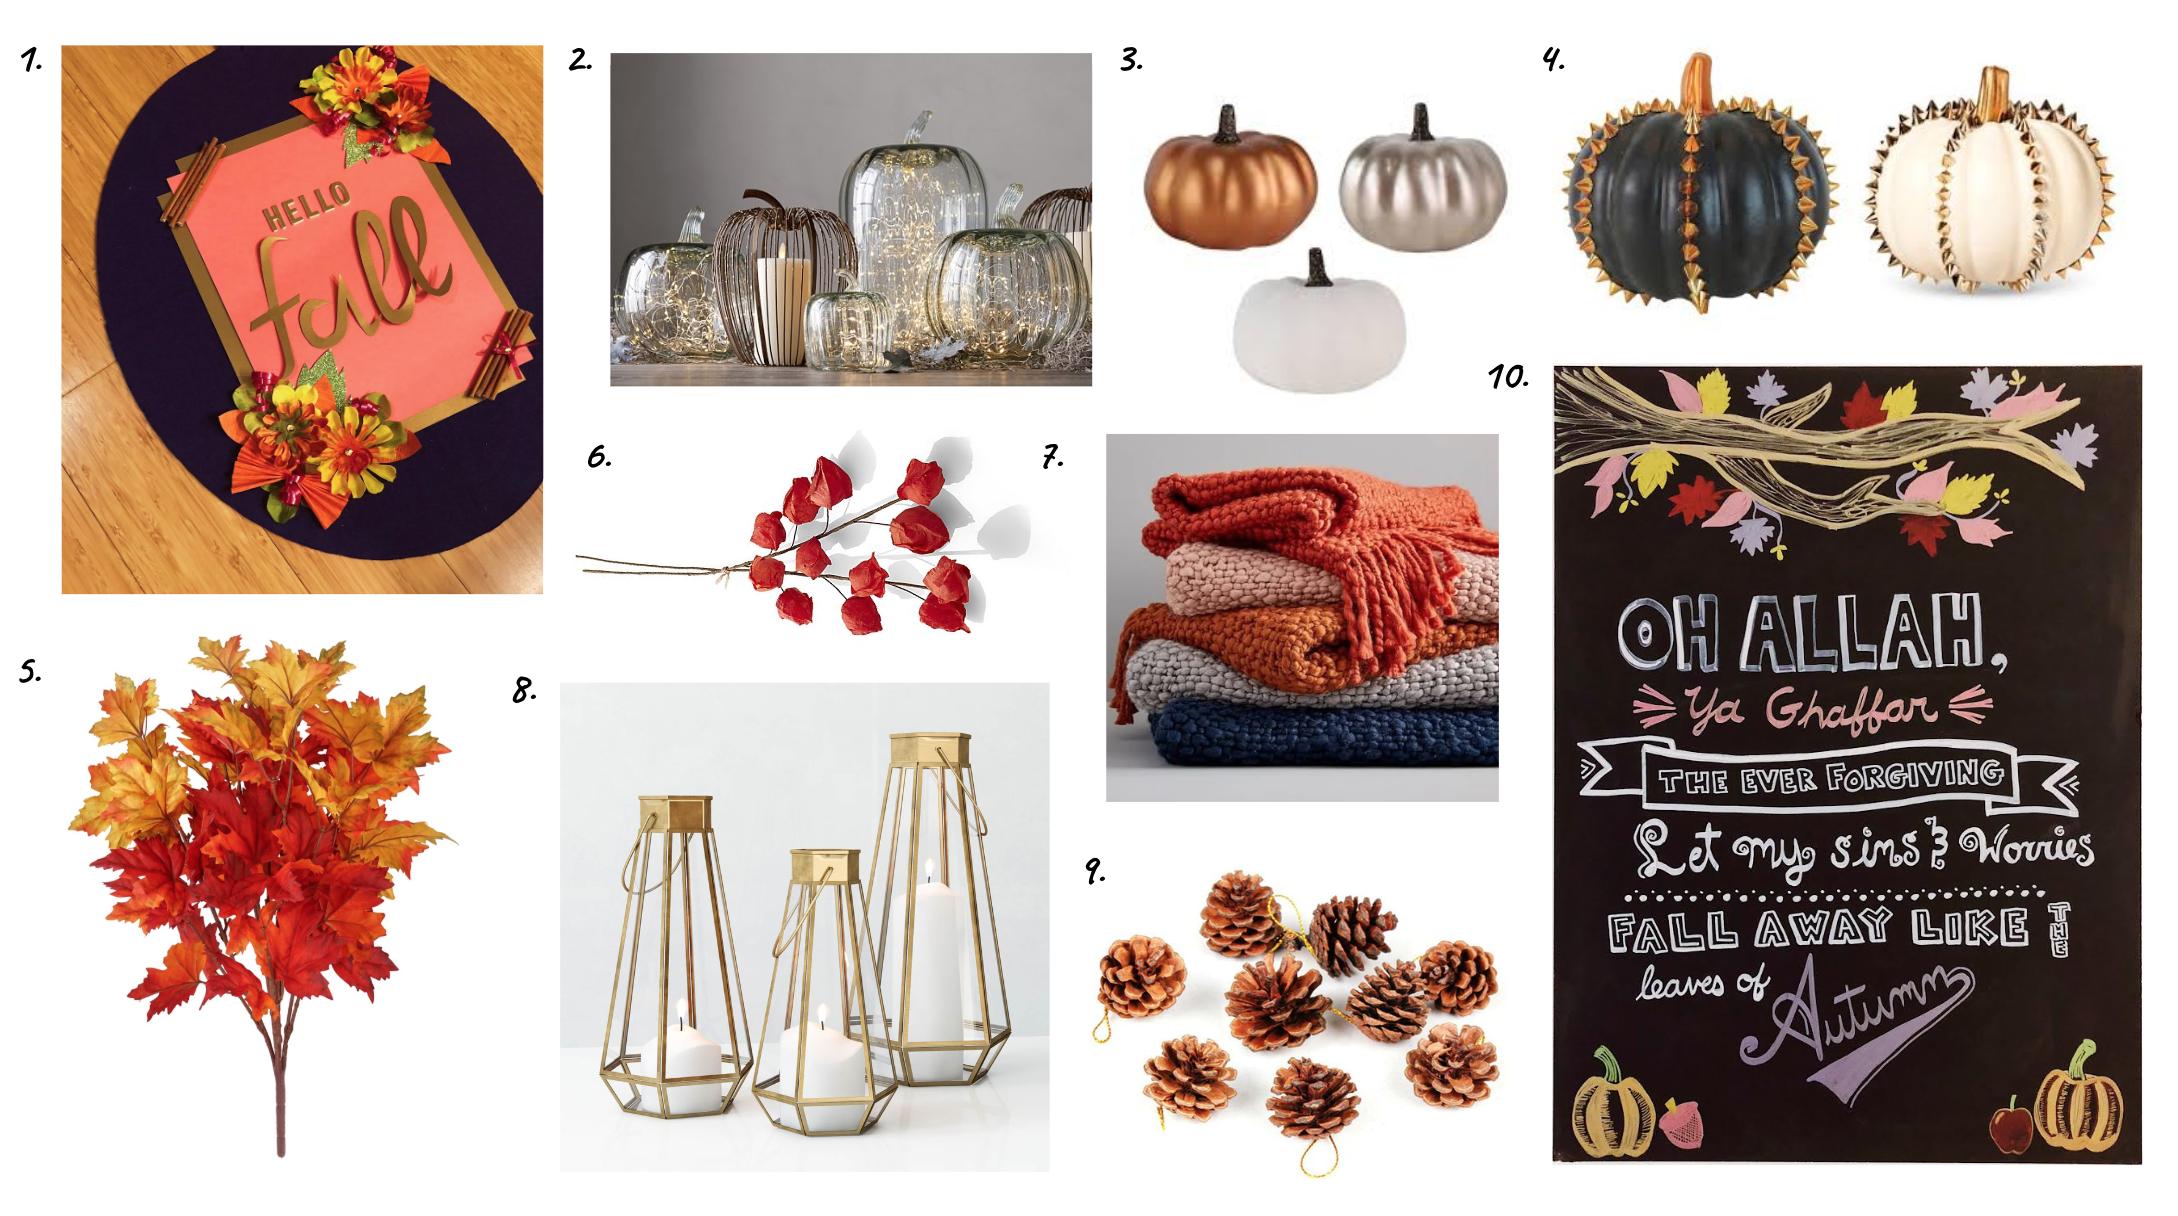 Muslim-home-decor-blog-modern-fall-decorating-inspiration-board